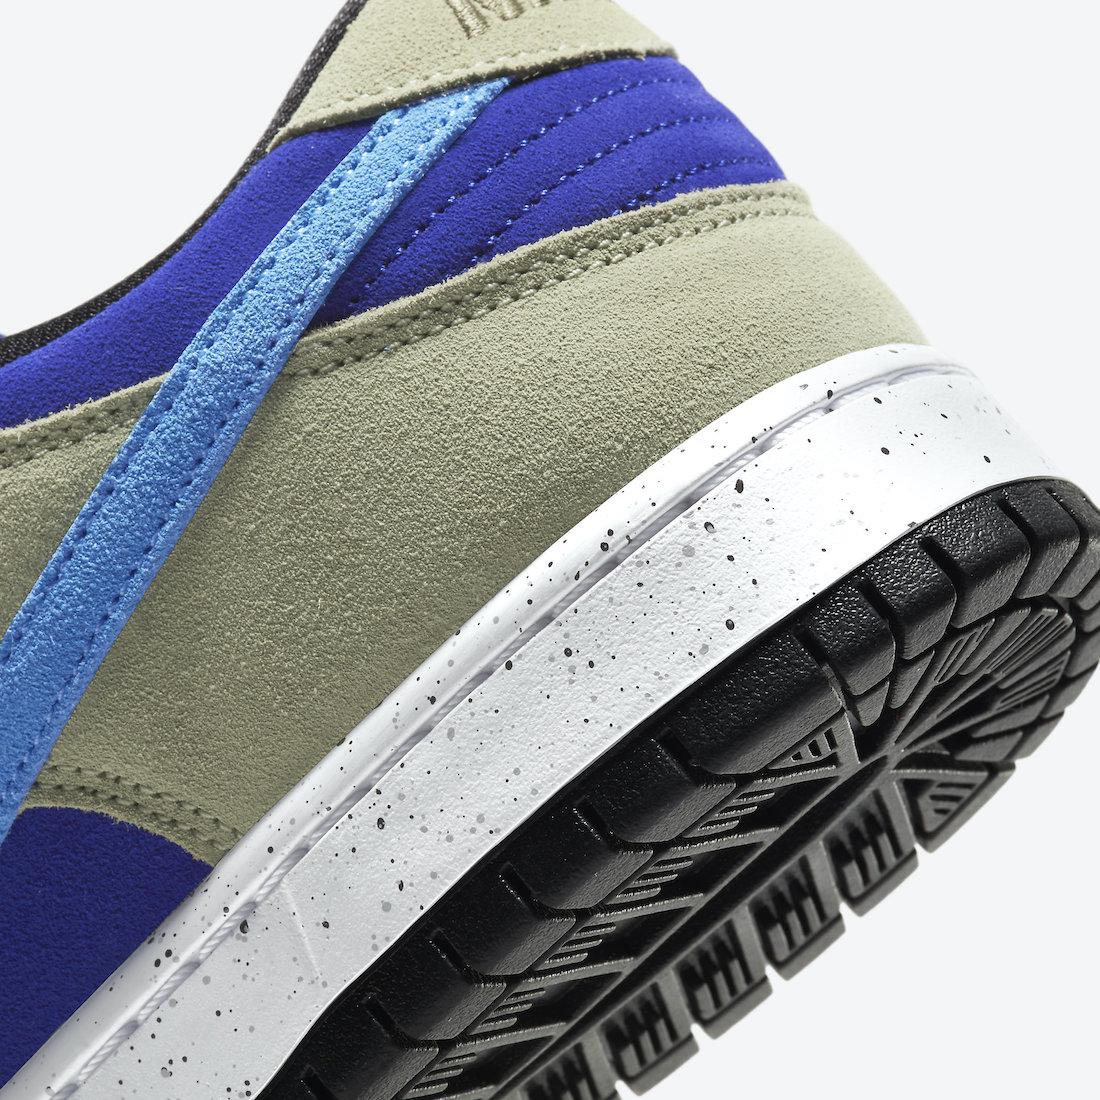 Nike SB Dunk Low Celadon BQ6817-301 Release Date